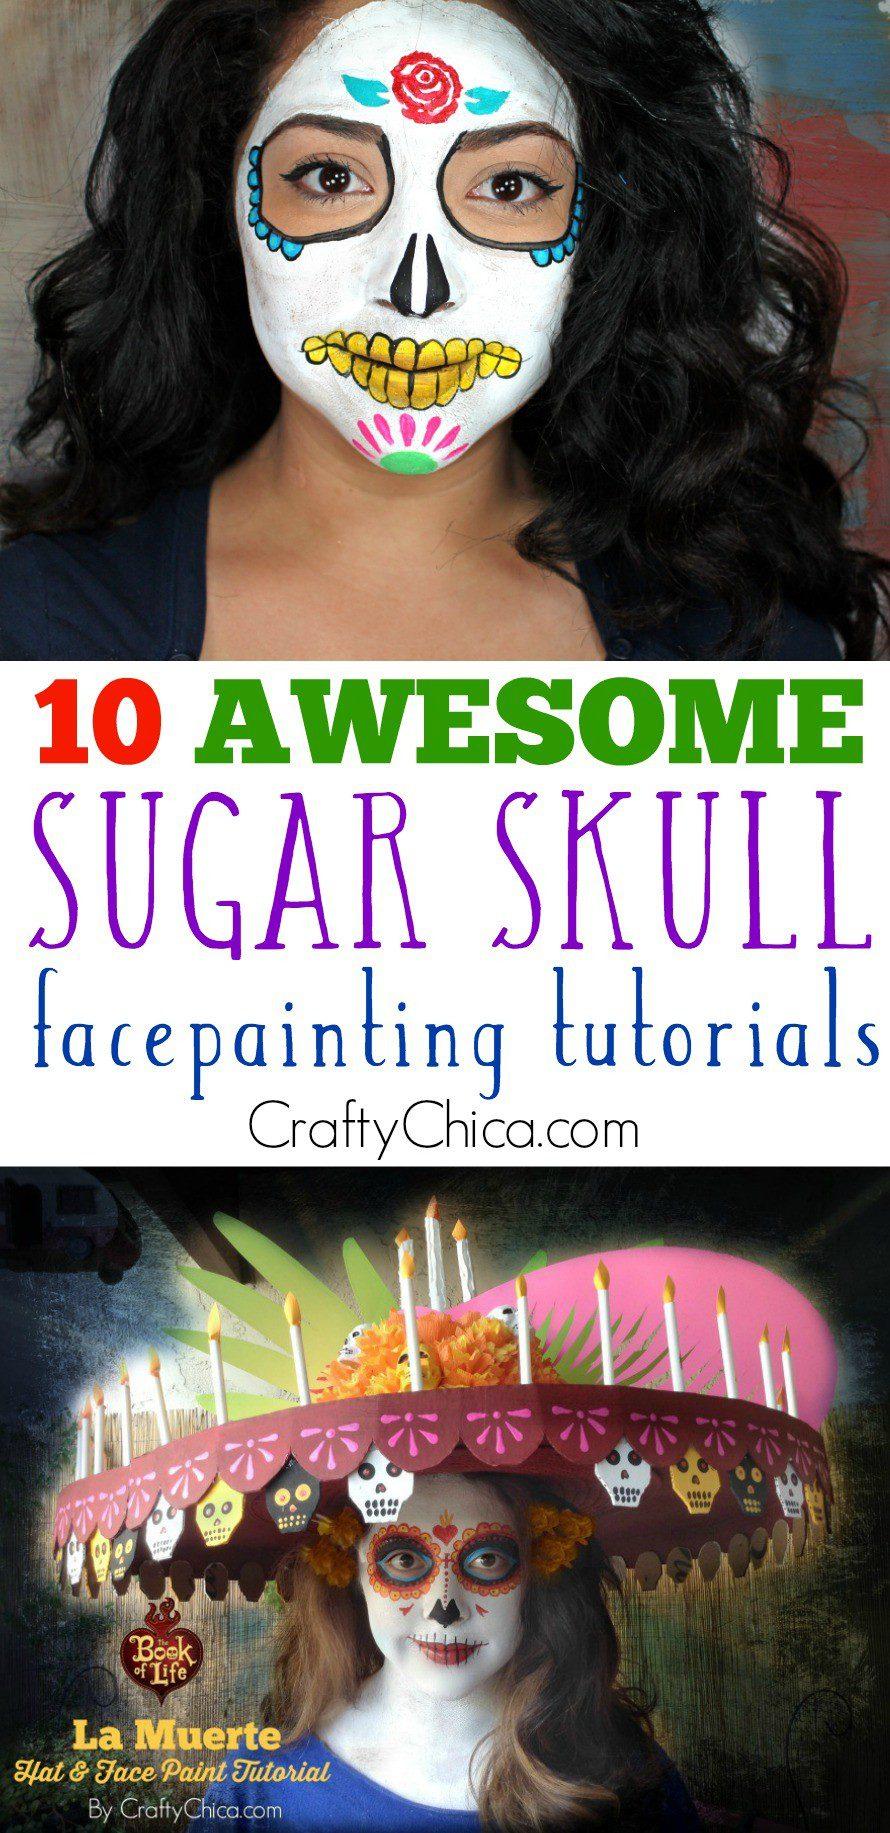 Candy Skull Face Paint : candy, skull, paint, Sugar, Skull, Paint, Tutorials, Crafty, Chica